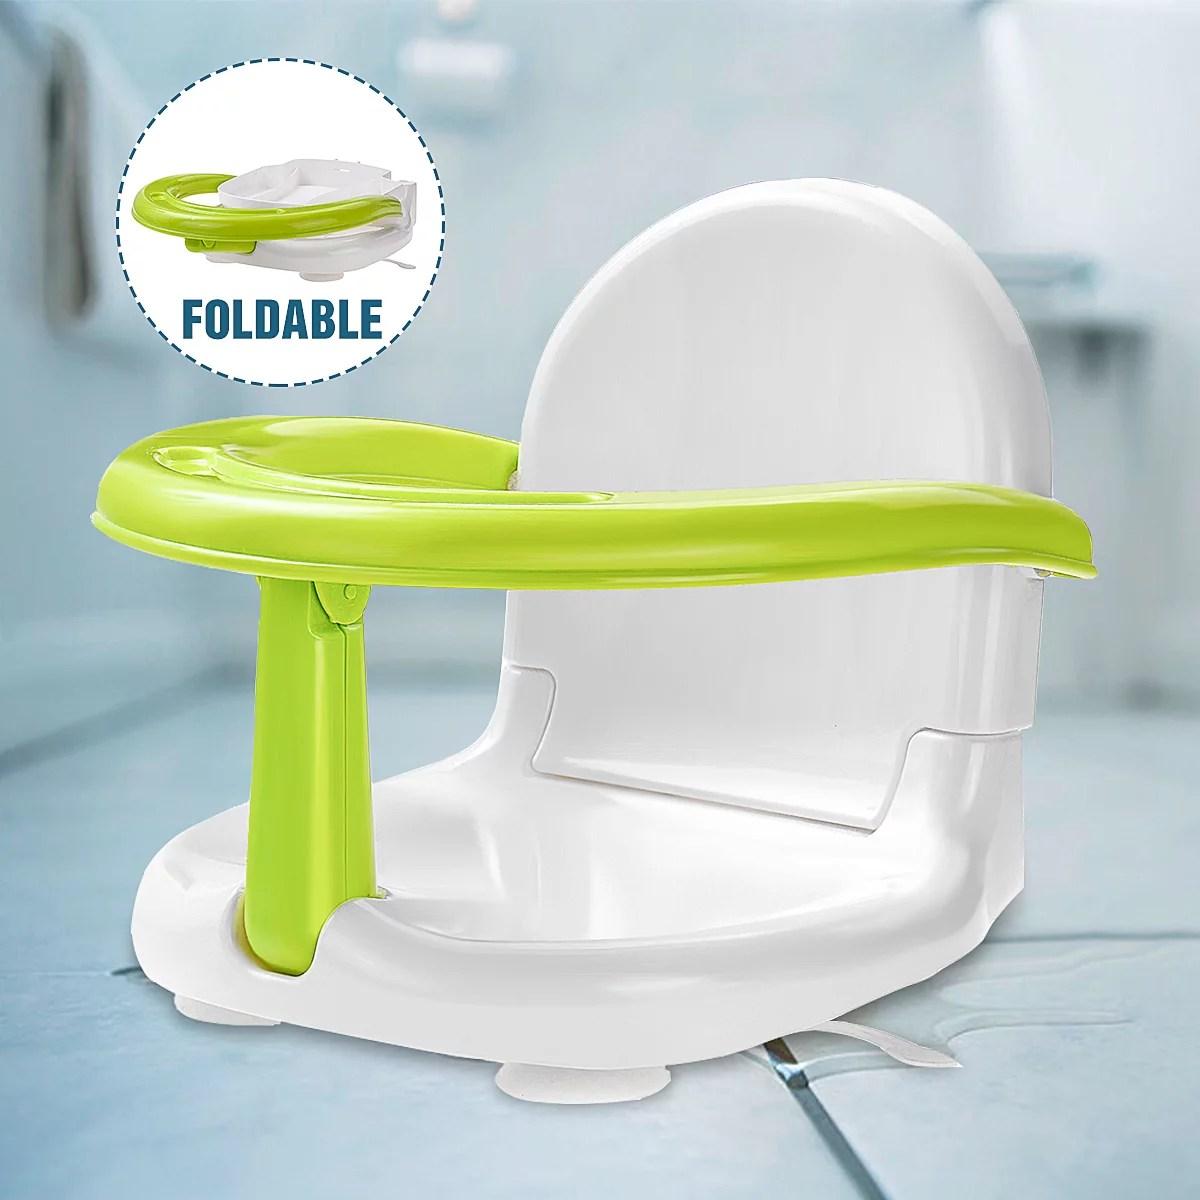 Foldable Baby Bath Seat Folding Anti-Skid Safety Shower ...